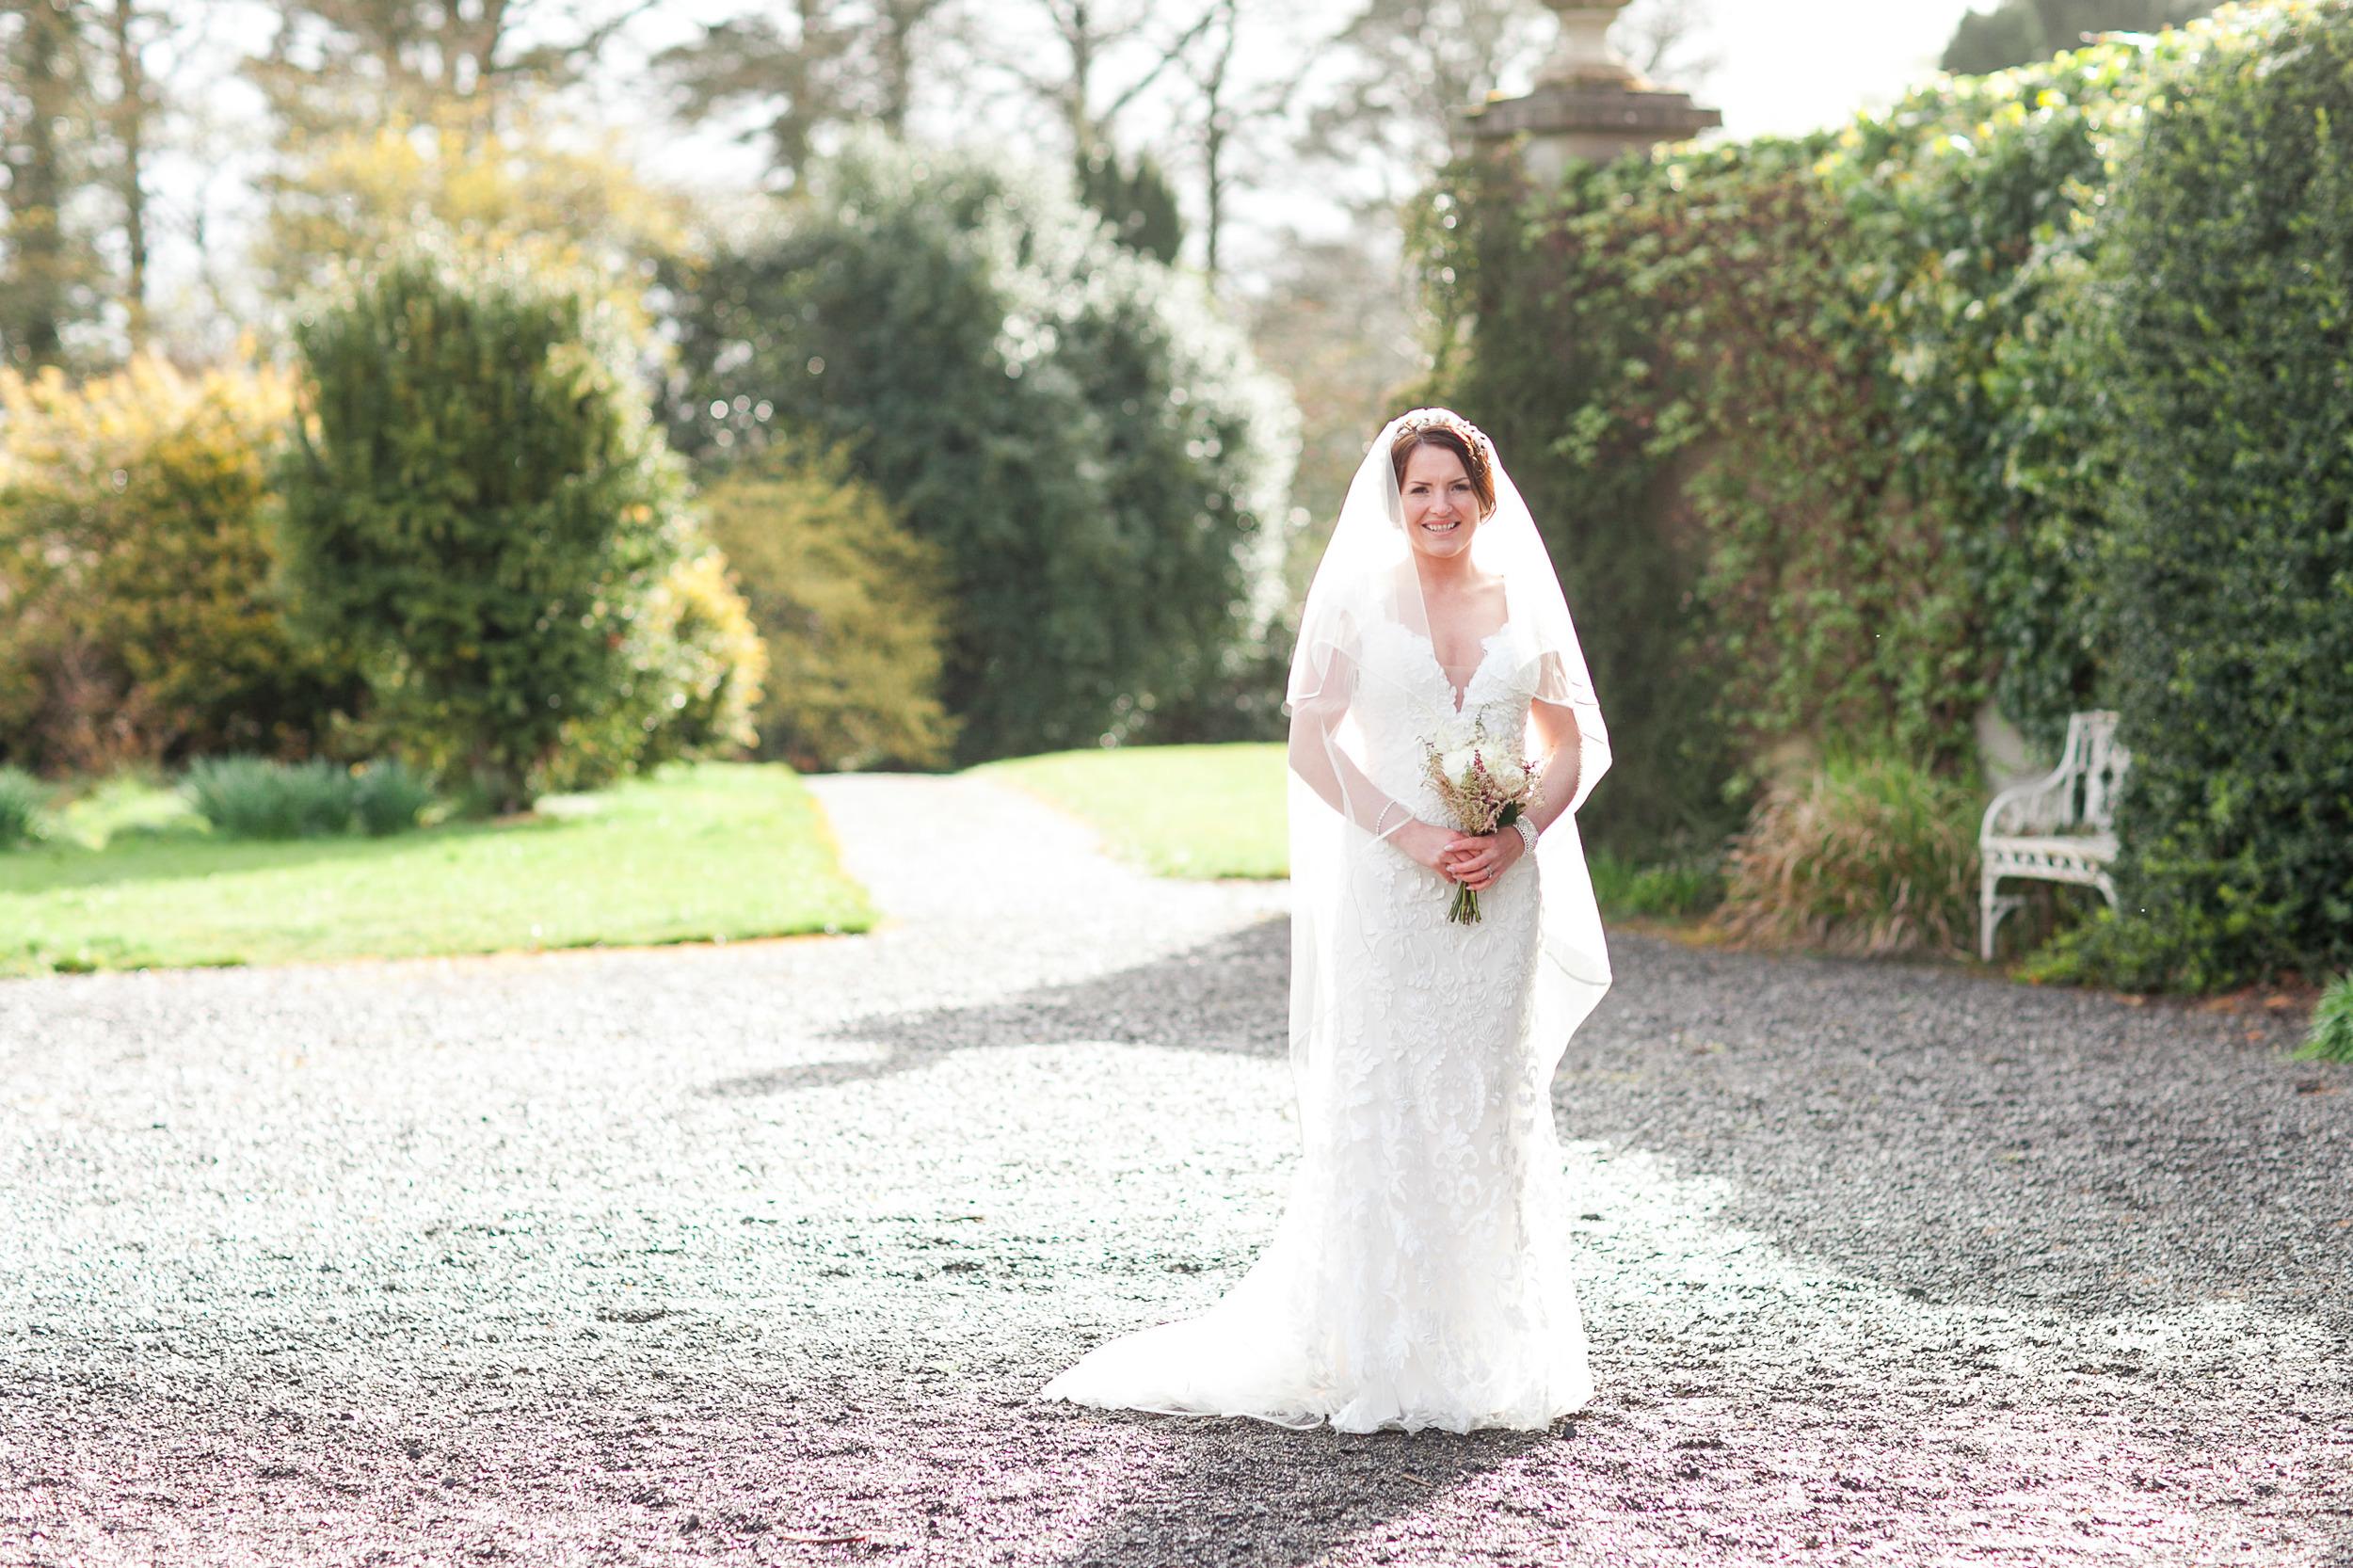 Ireland-Kildare-Wedding-Photographer-0049.jpg